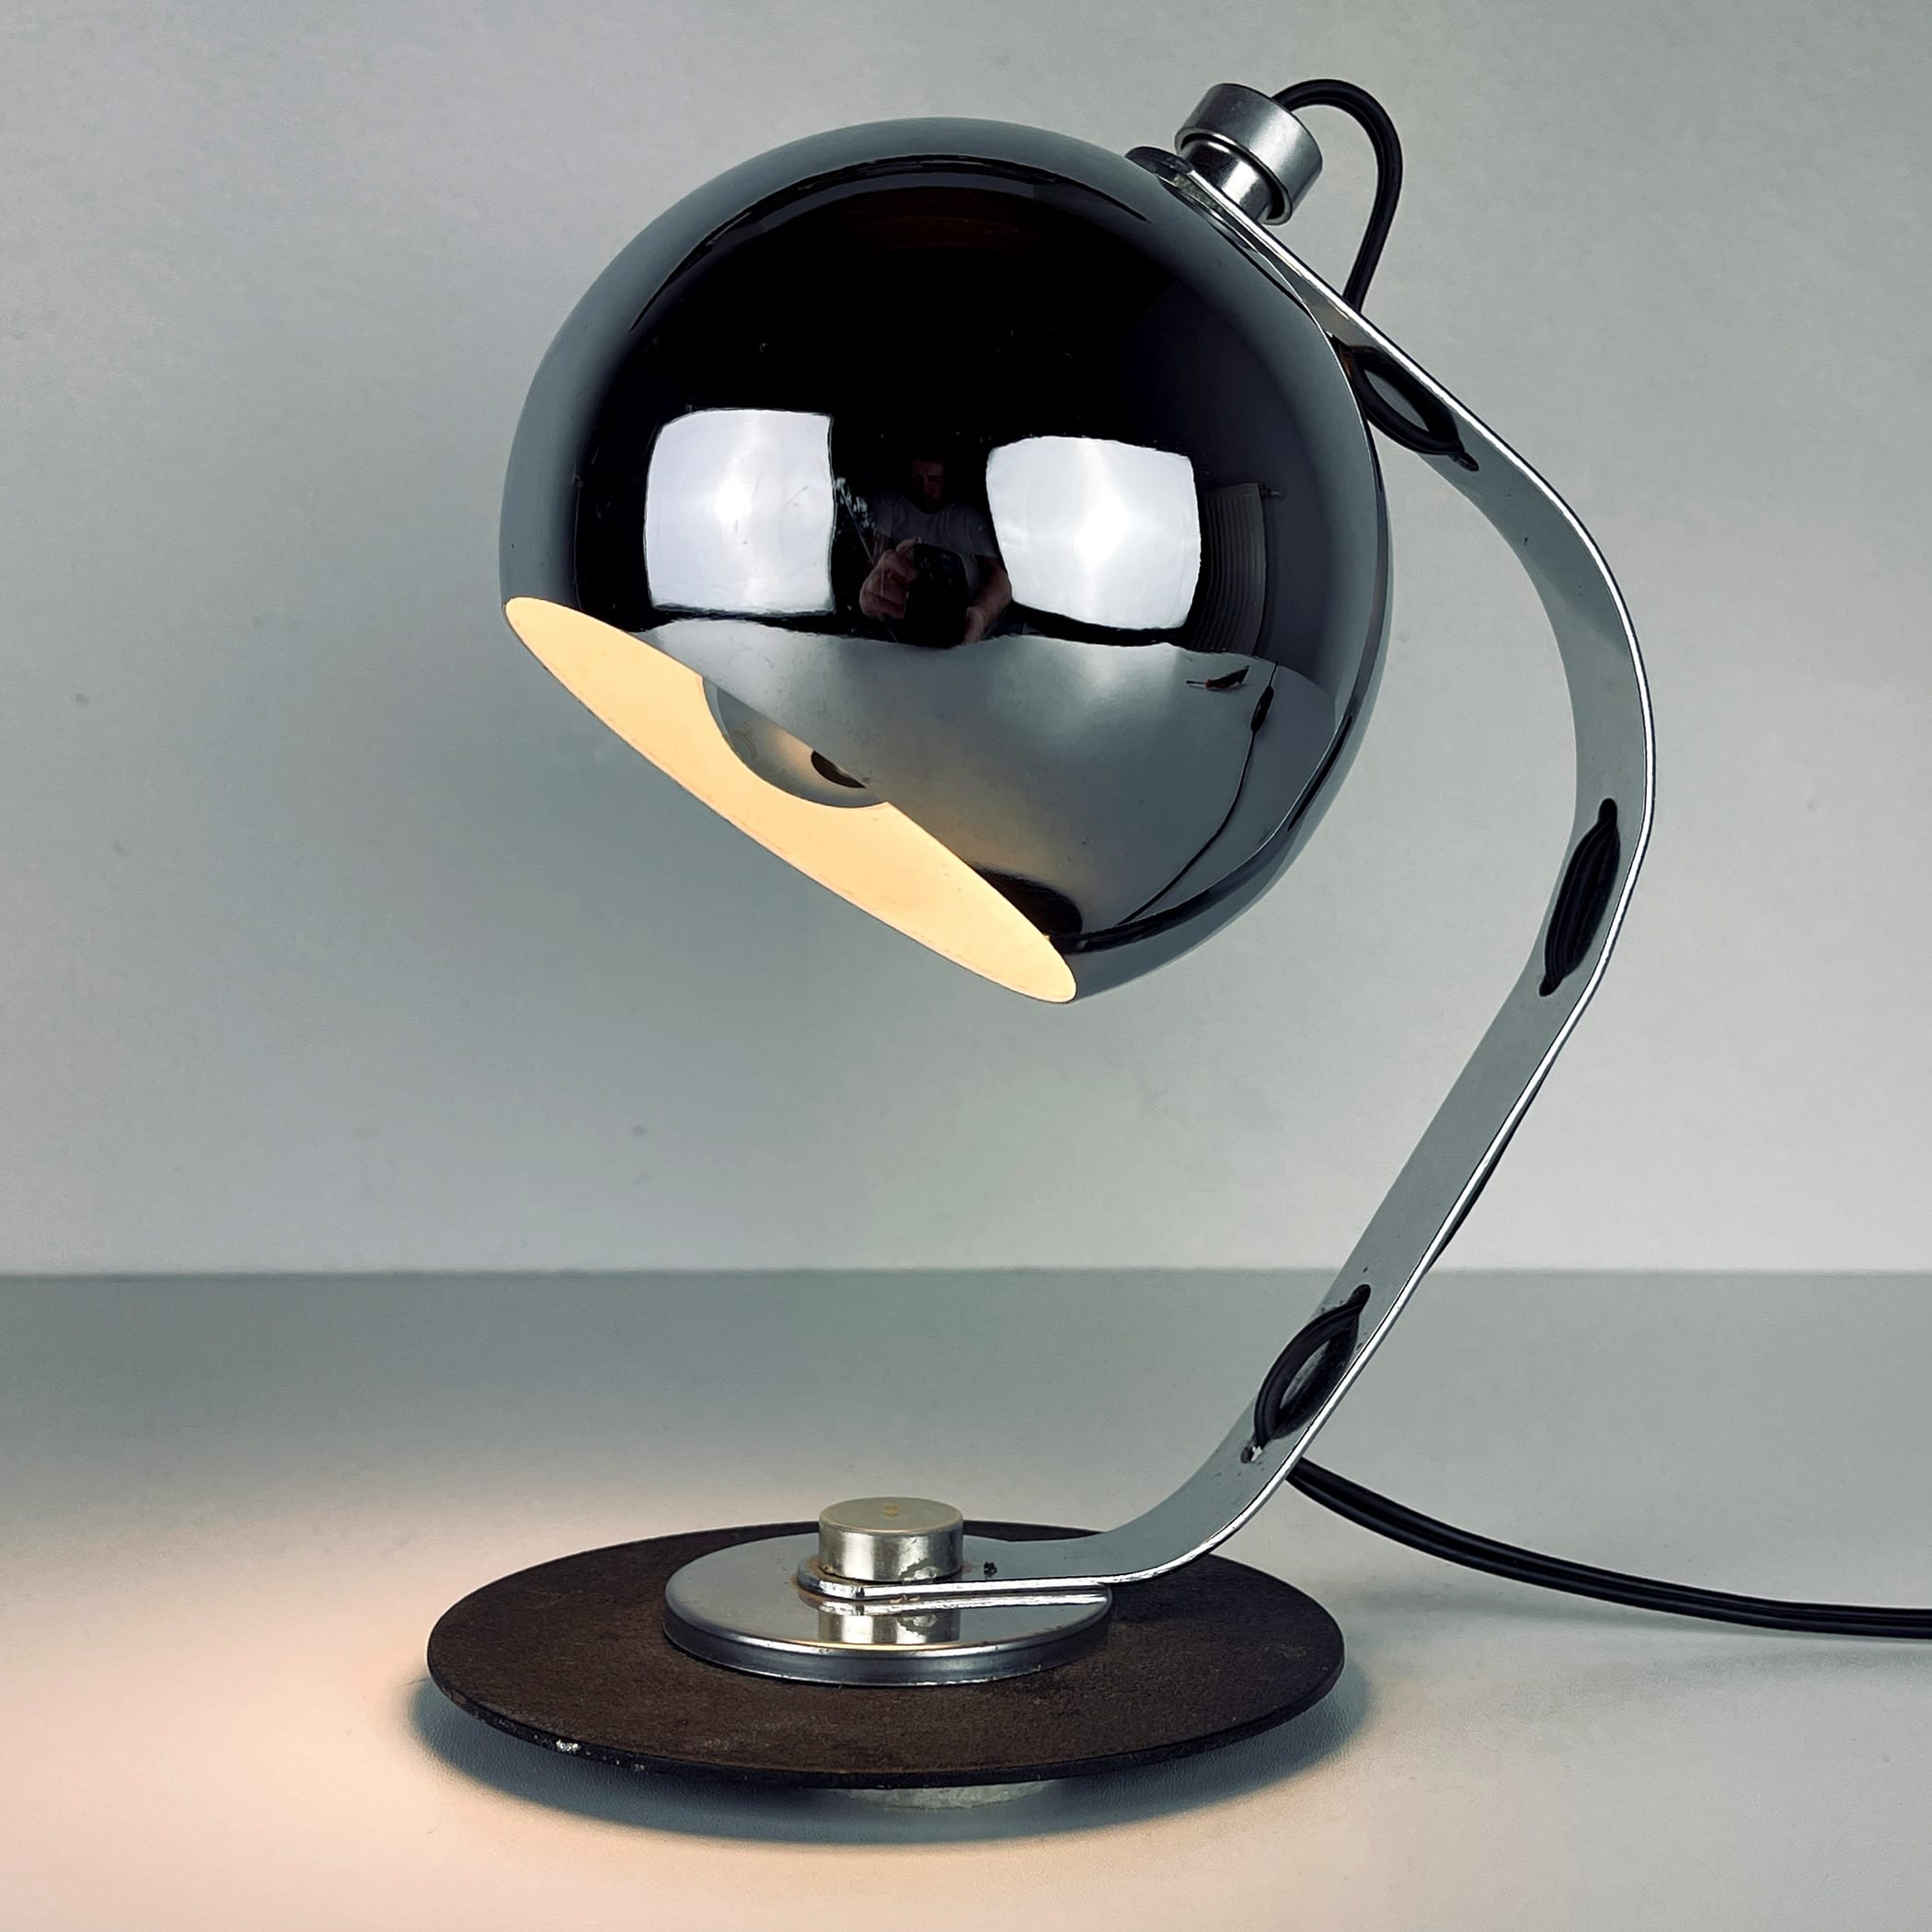 Mid-century desk lamp Eyeball Italy 1970s Space age Atomic metal chrome table lamp Retro home decor